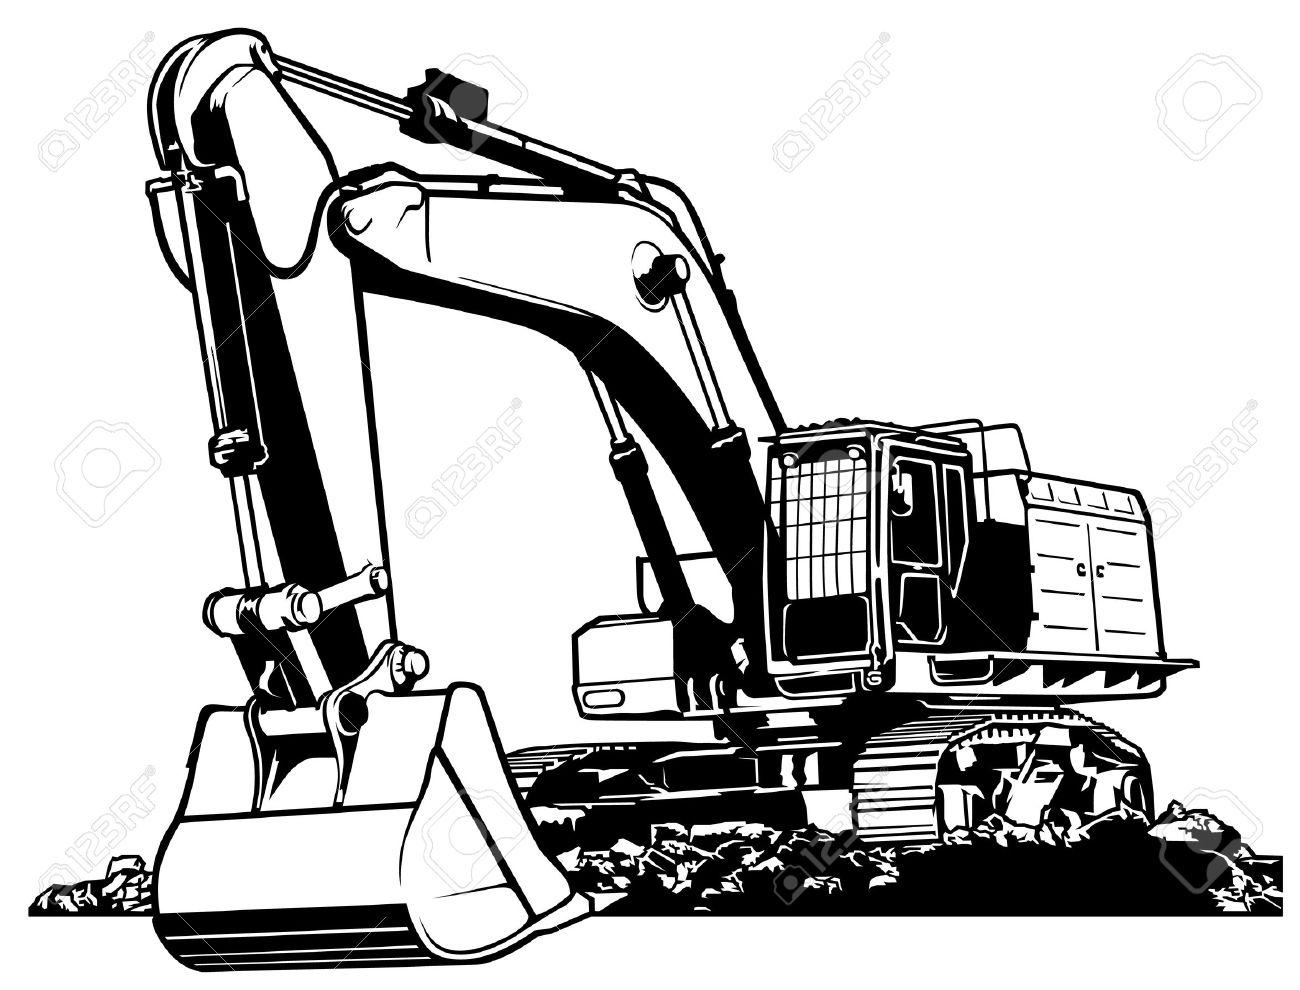 Excavator Black and White Outlined Illustration.